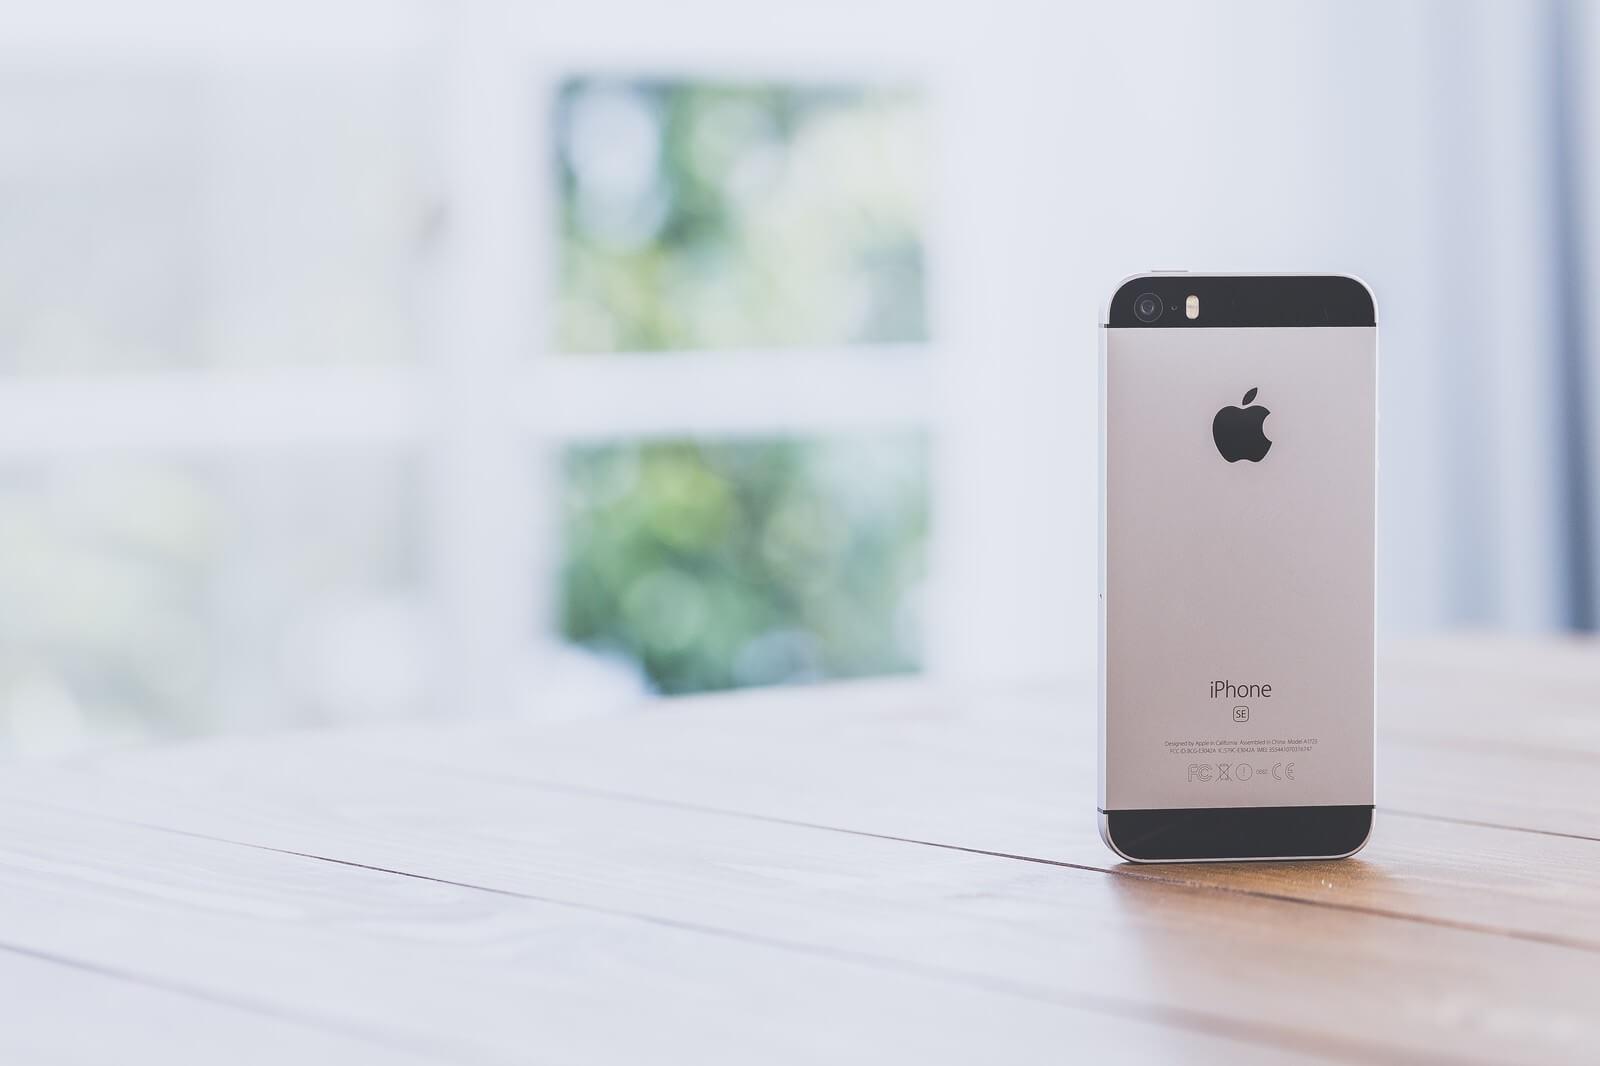 SIMロック解除(SIMフリー化)した大手キャリアのiPhone